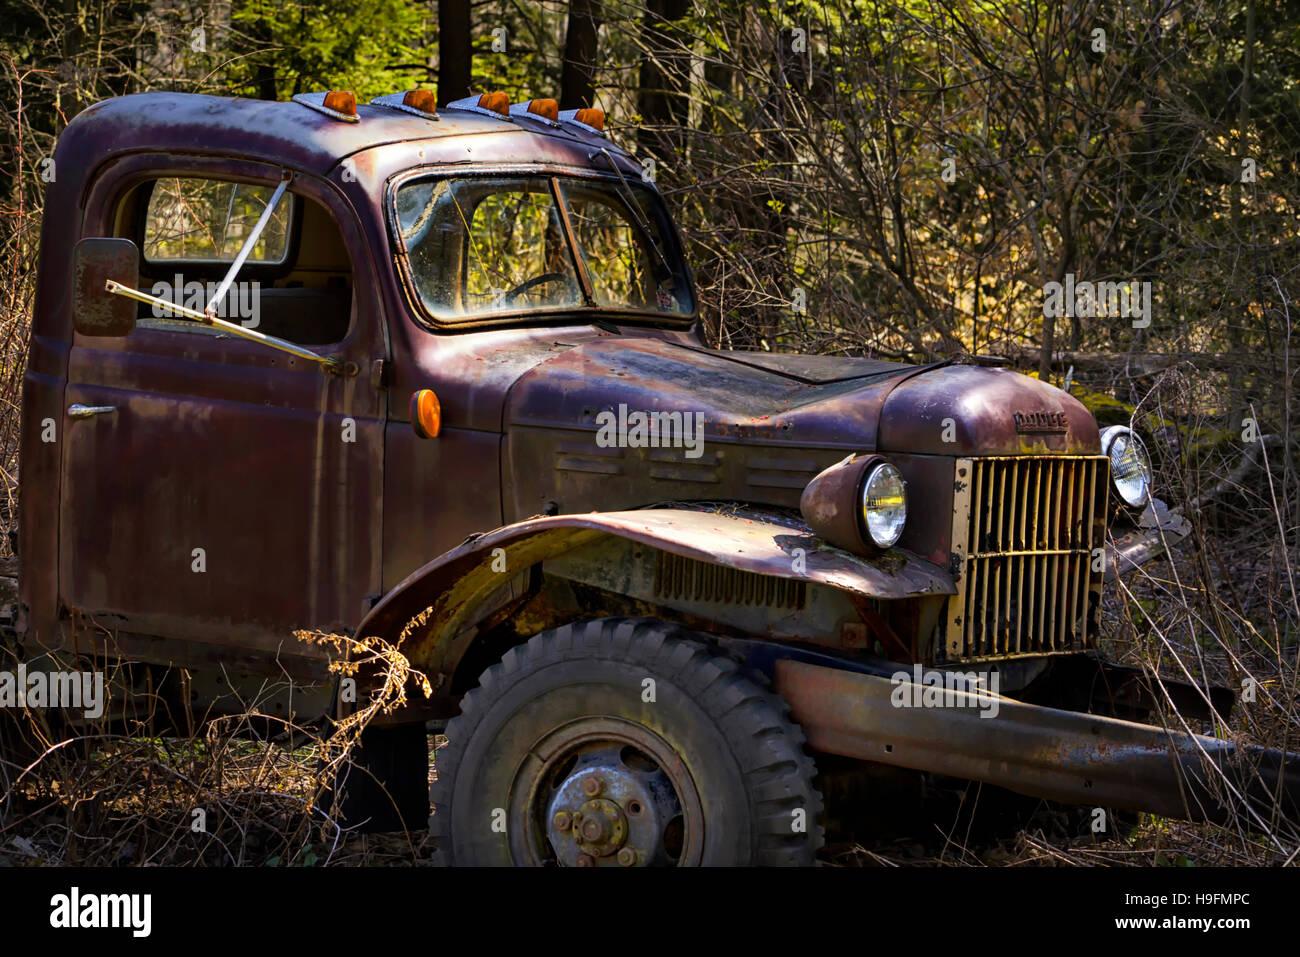 1952 Dodge old pickup truck Stock Photo: 126350068 - Alamy